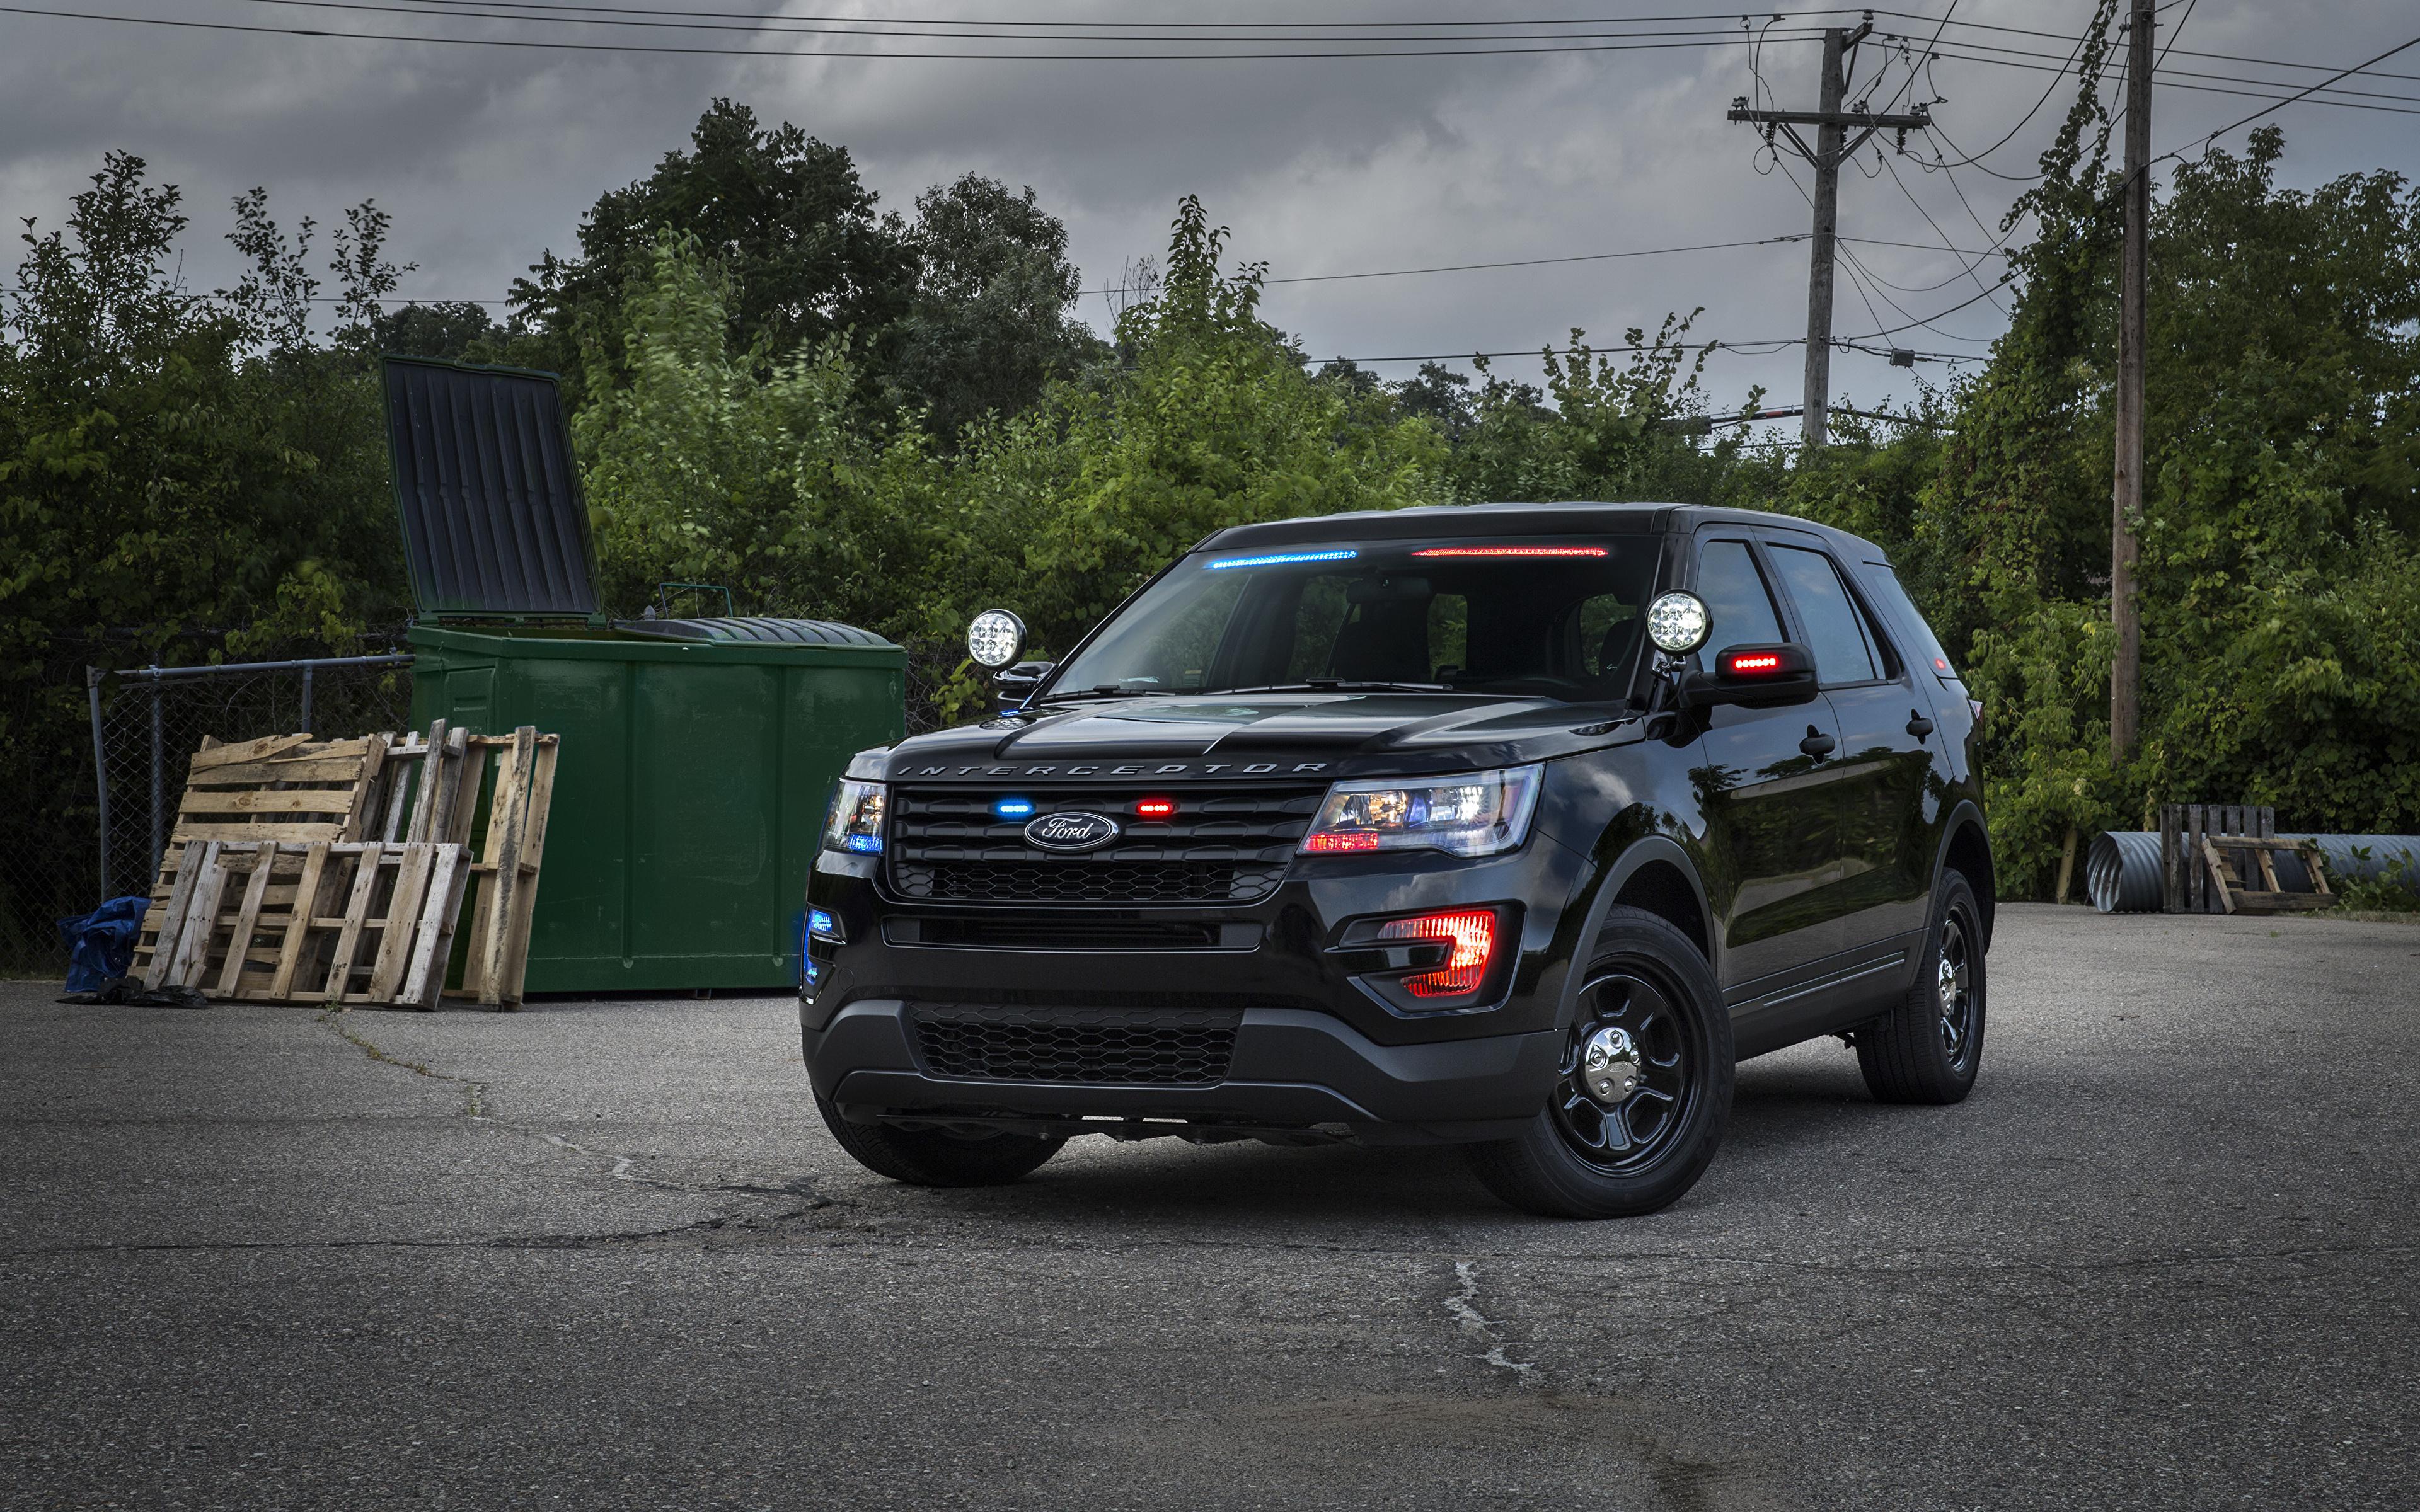 Photos Ford Police Explorer Black Auto 3840x2400